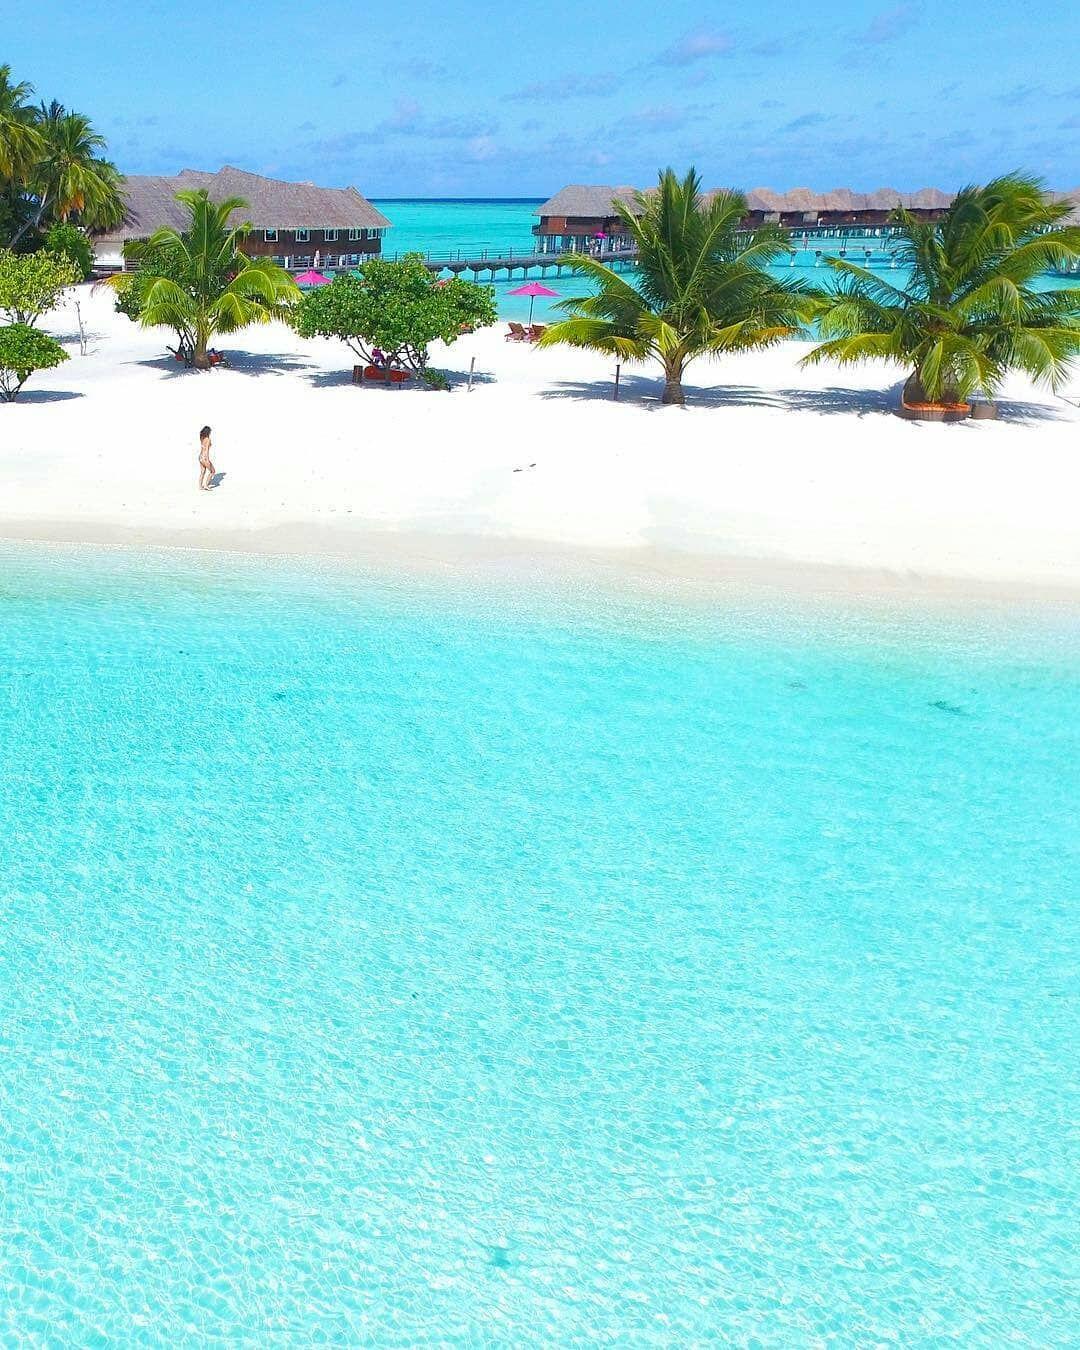 The Maldives Islands - Anantara Dhigu Maldives